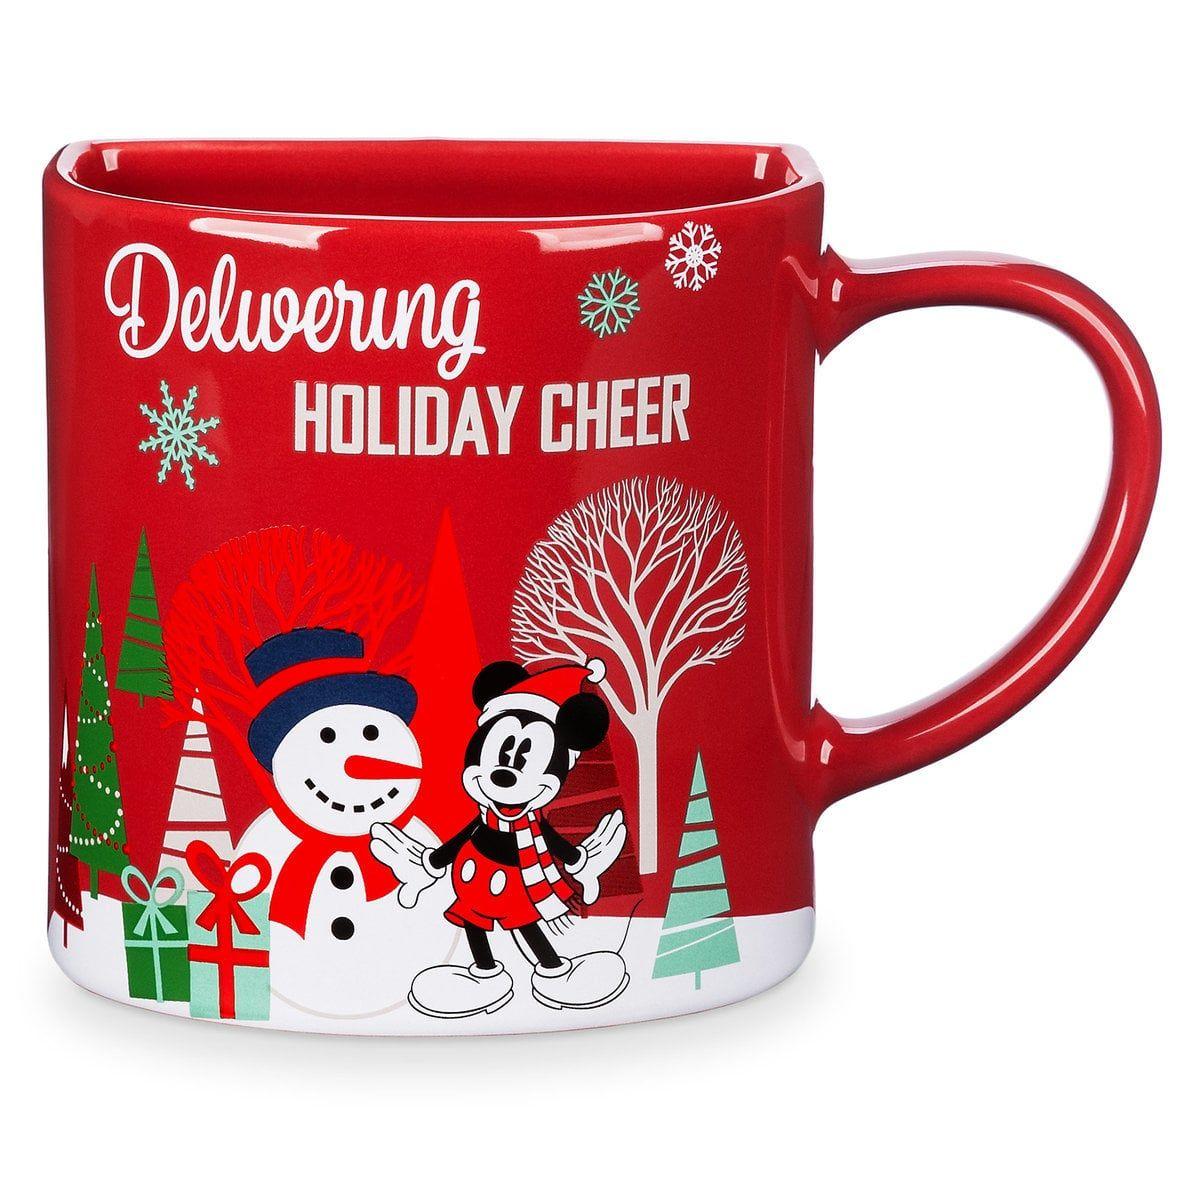 Mickey Mouse Holiday Cookie Holder Mug Disney Mugs Disney Store Mugs Christmas Mugs